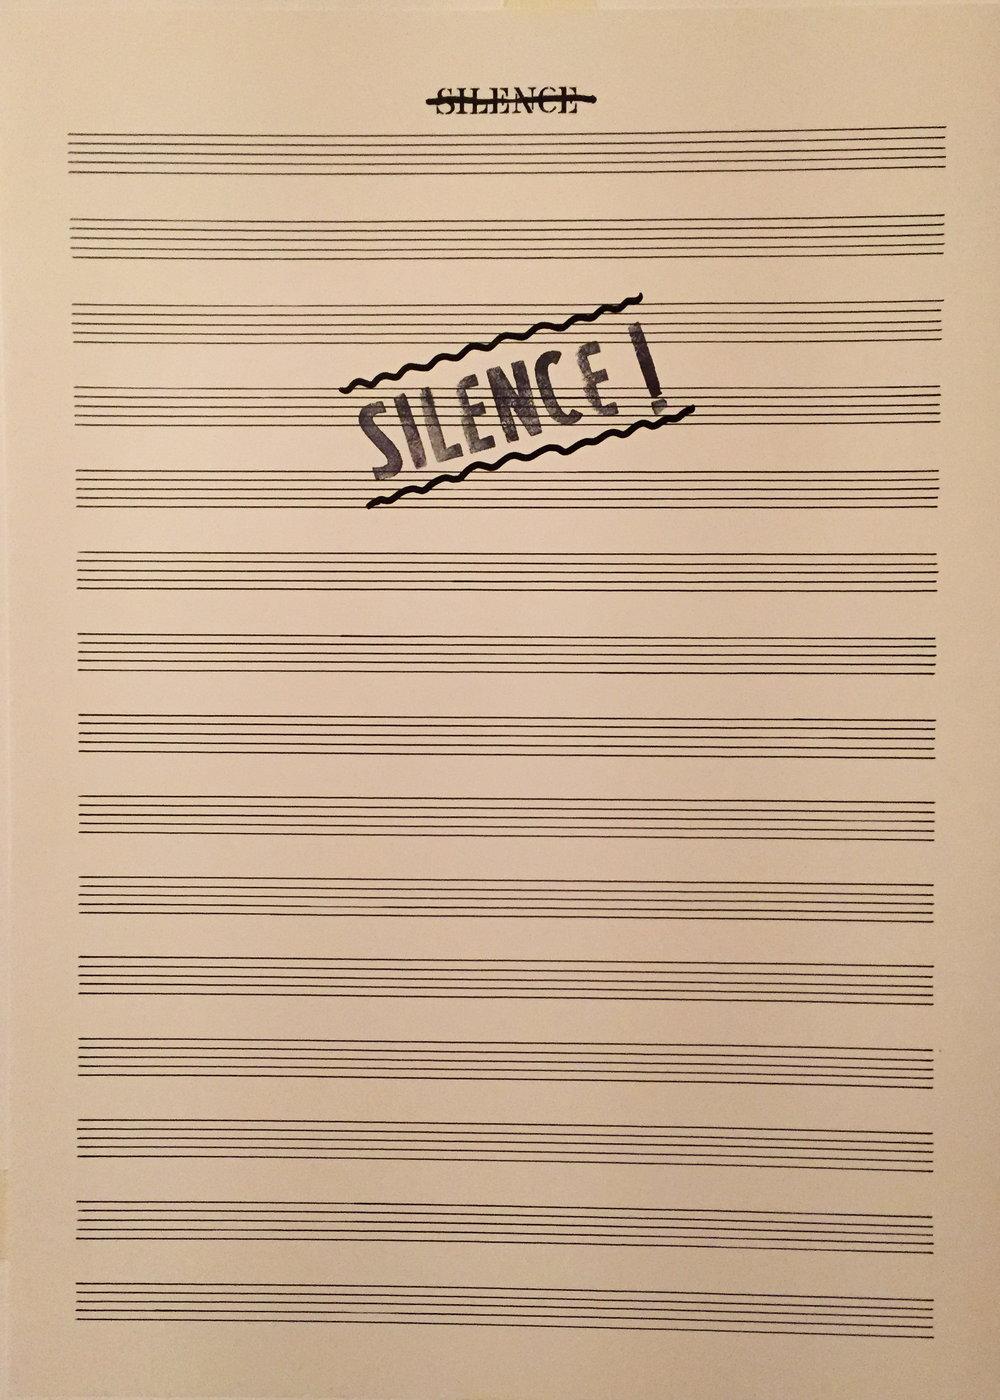 Tóth Dežo, 1977 - 78, Silence, komb. tech, 45x33,5.jpg